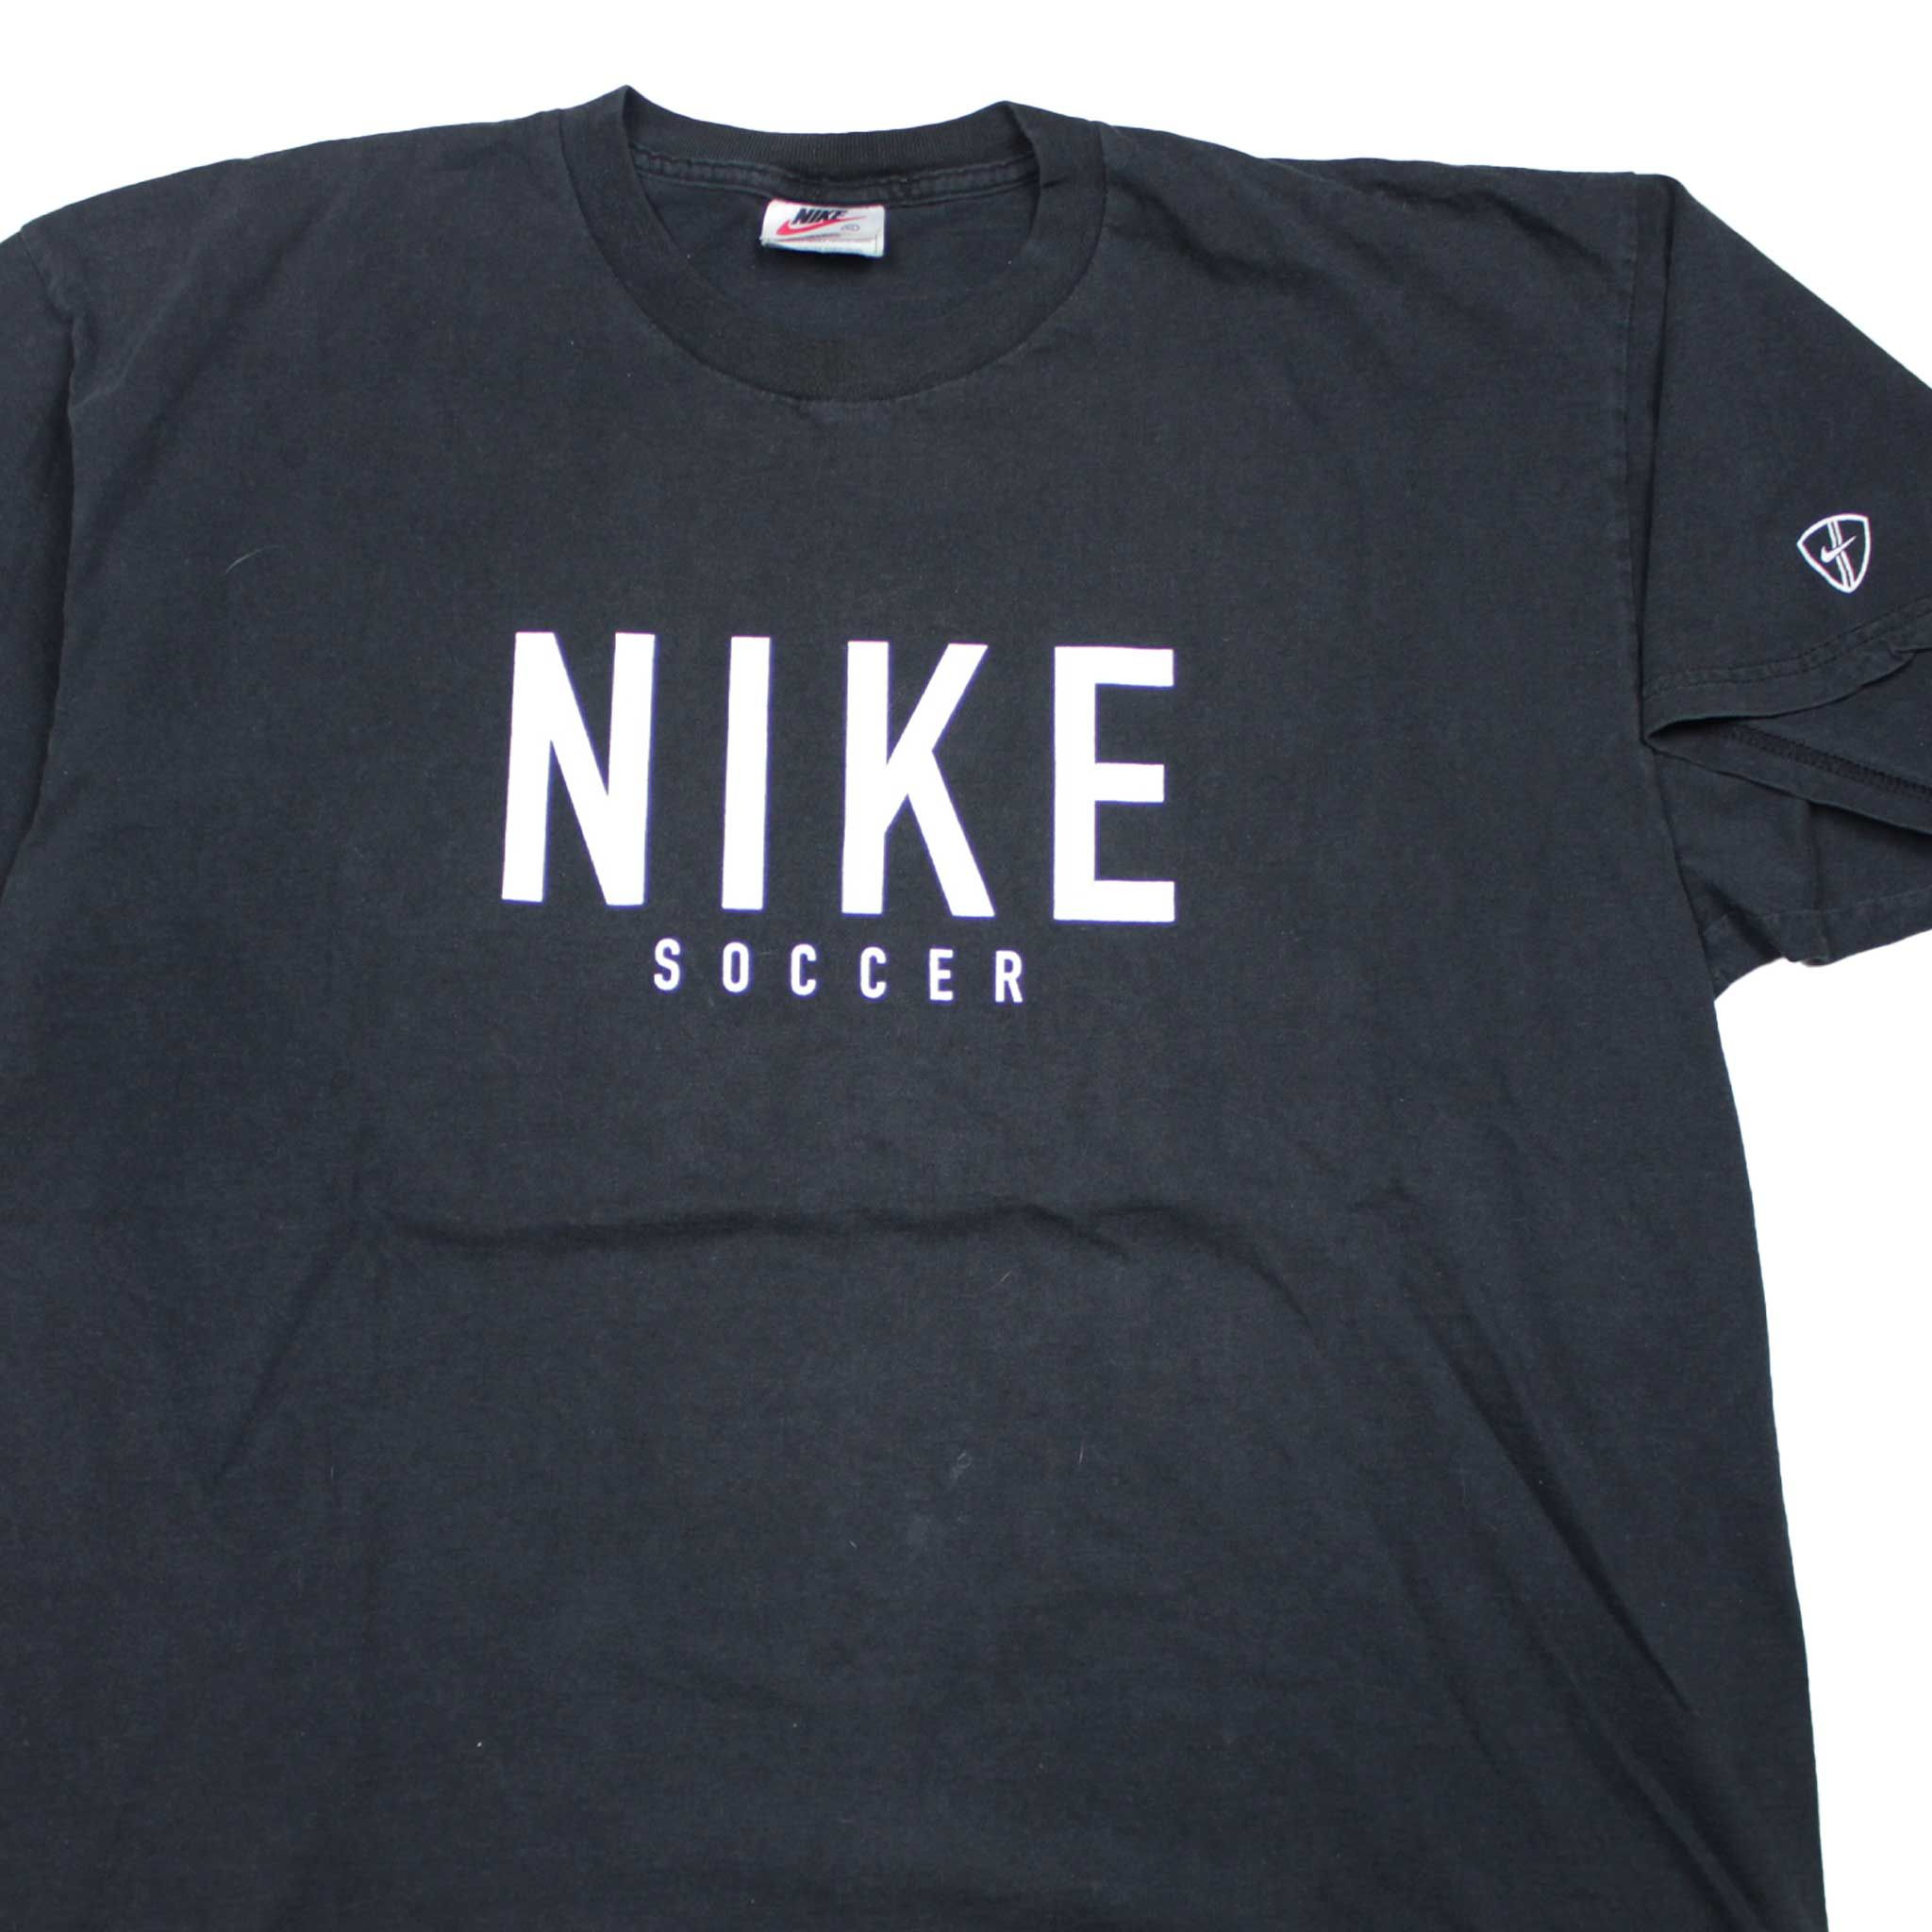 Photo of 90's Nike Soccer Tee